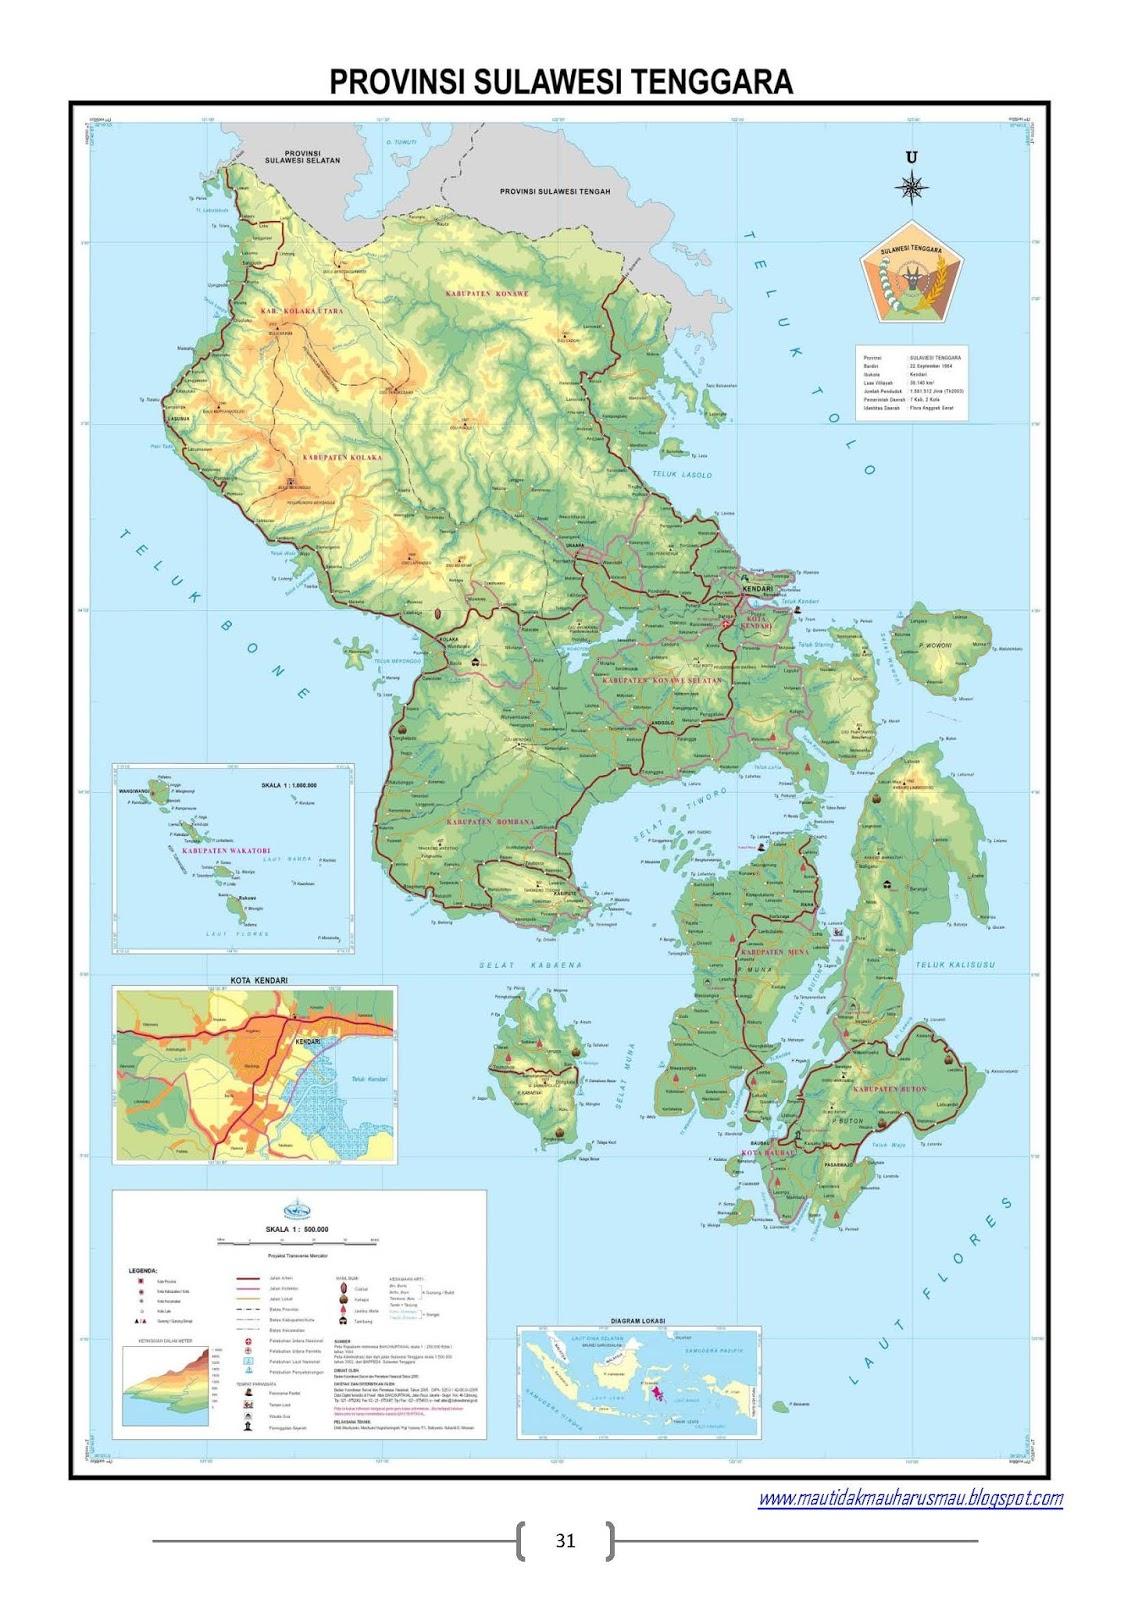 Peta 34 Provinsi Di Indonesia Ma Walisongo Kaliori Rembang